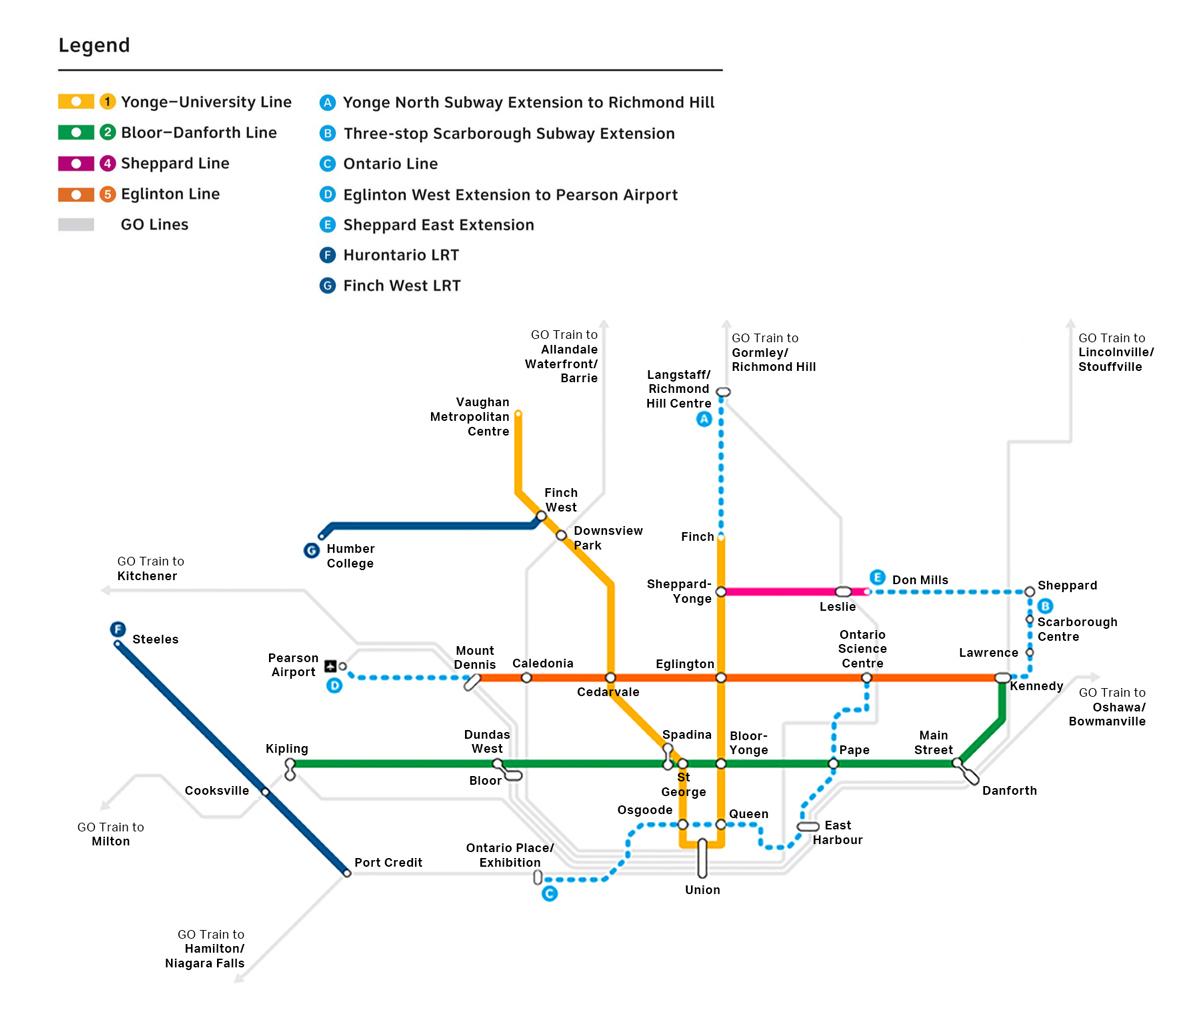 Fig 1. Four metro priorities in Toronto